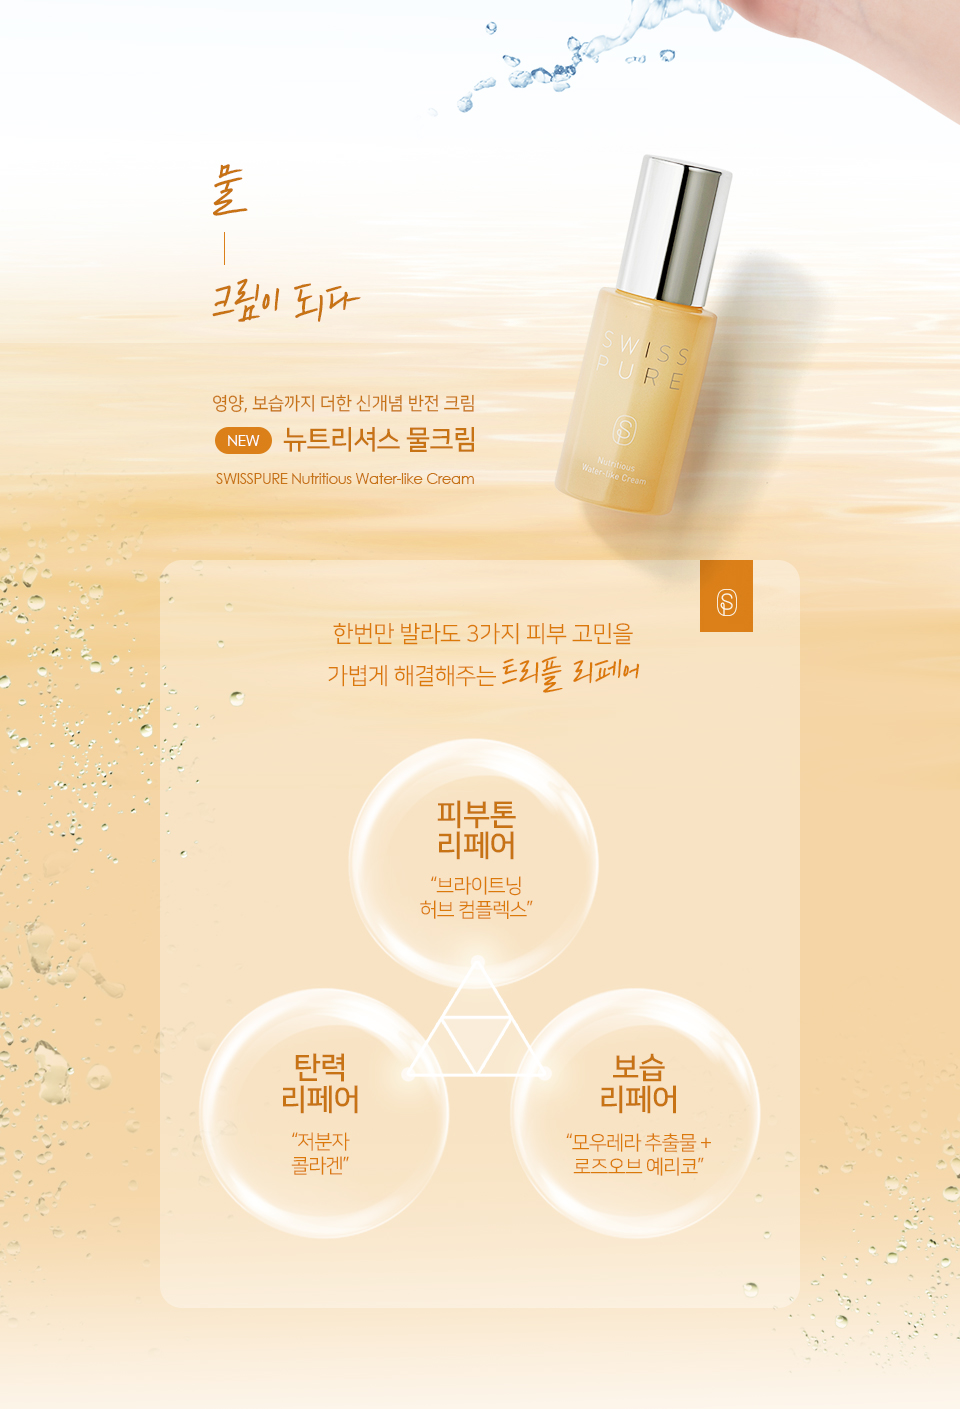 Mod3_Nutritious Water like Cream_04.jpg